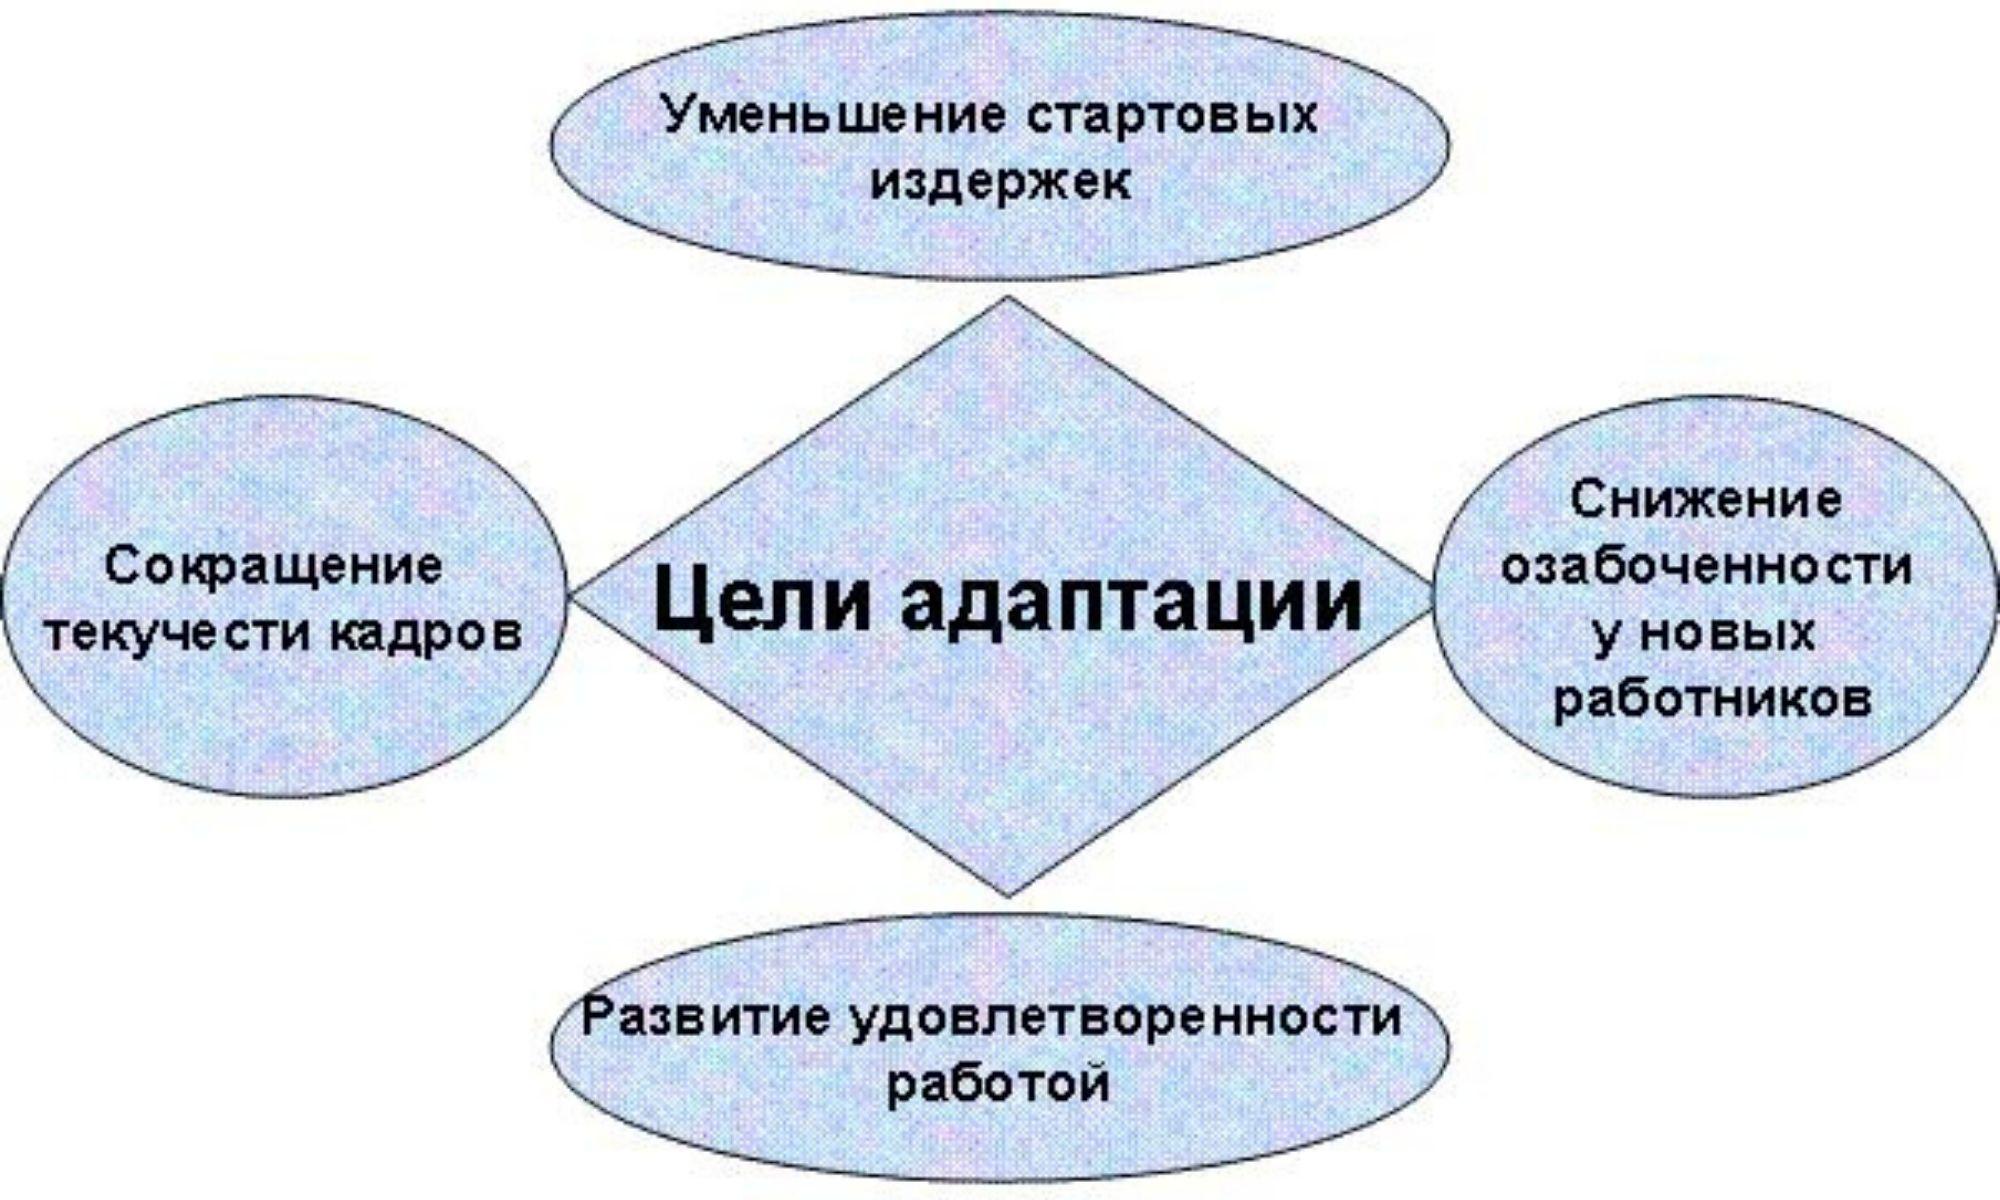 Что такое адаптация: виды адаптации персонала